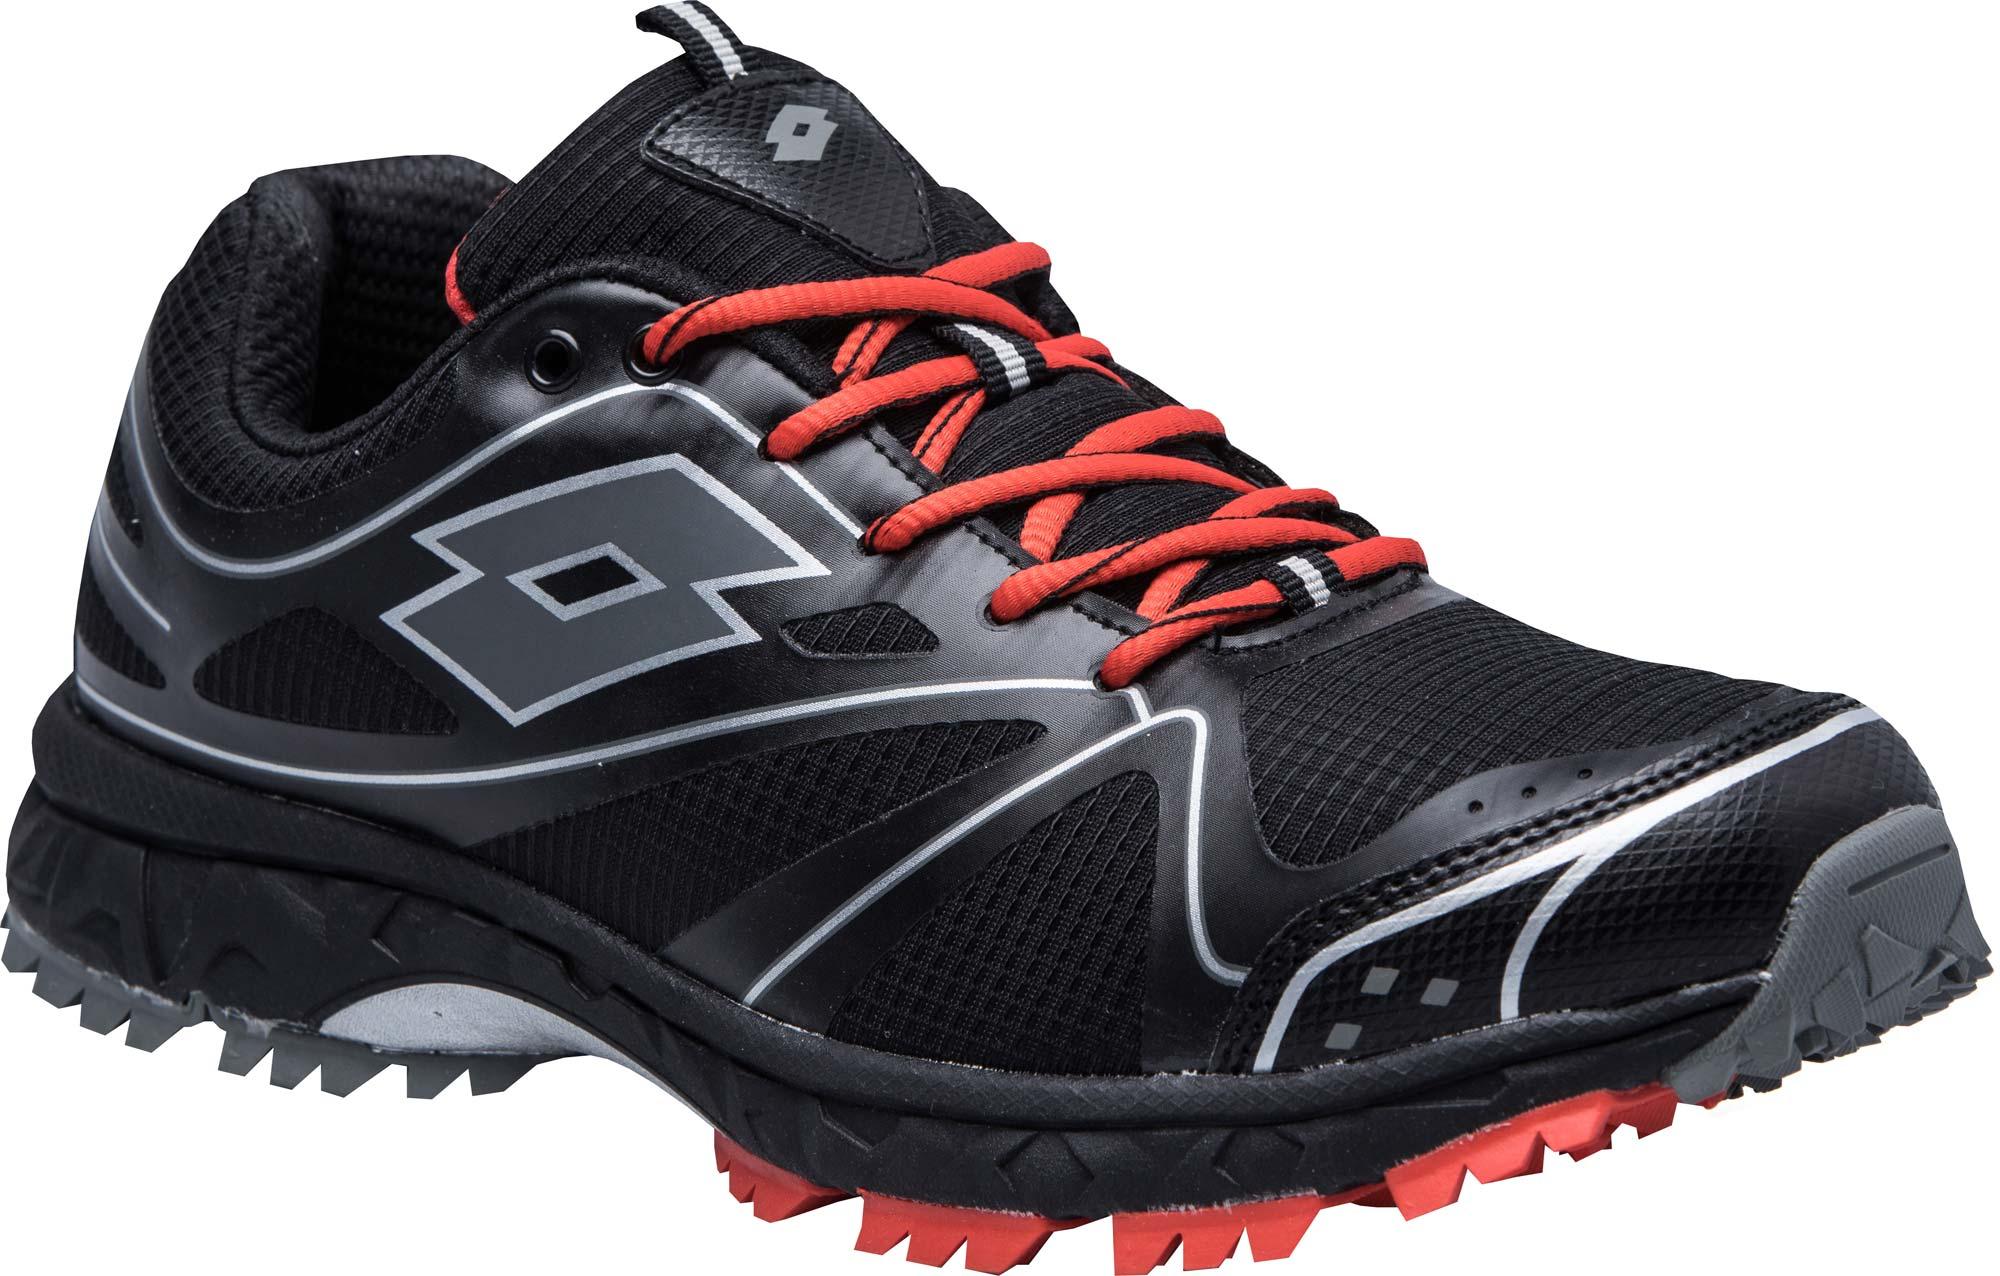 buty do biegania w terenie Lotto Moonrun 600 II